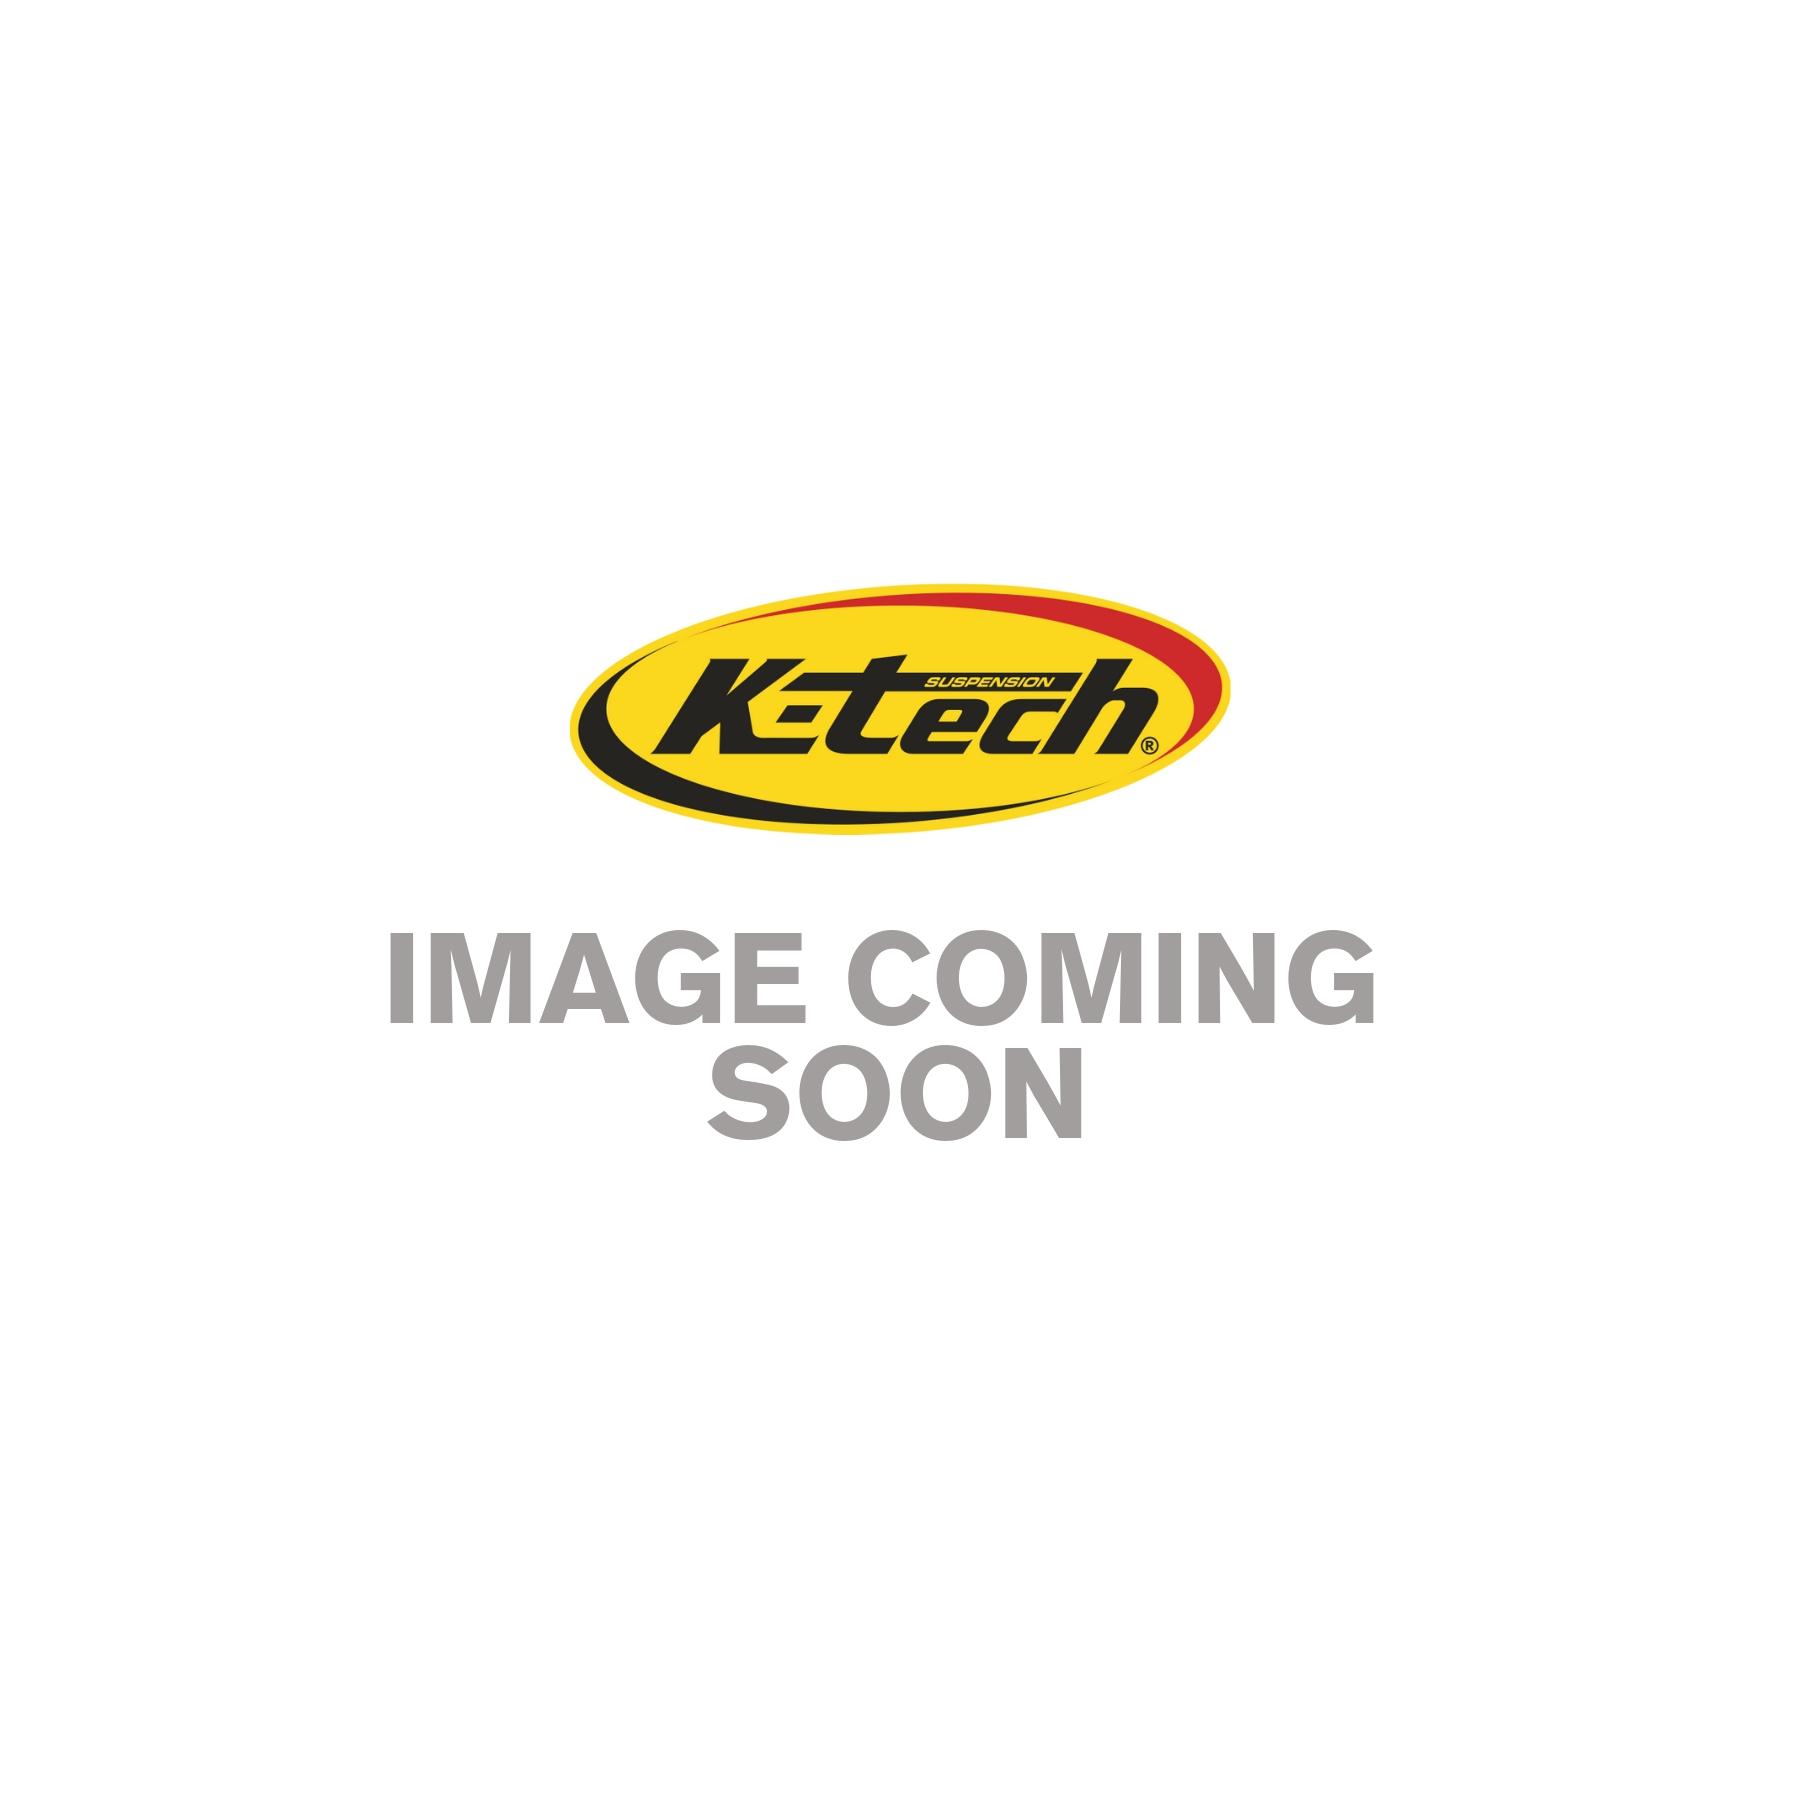 DDS Front Fork Cartridge Triumph Daytona 675-R 2013> Ohlins